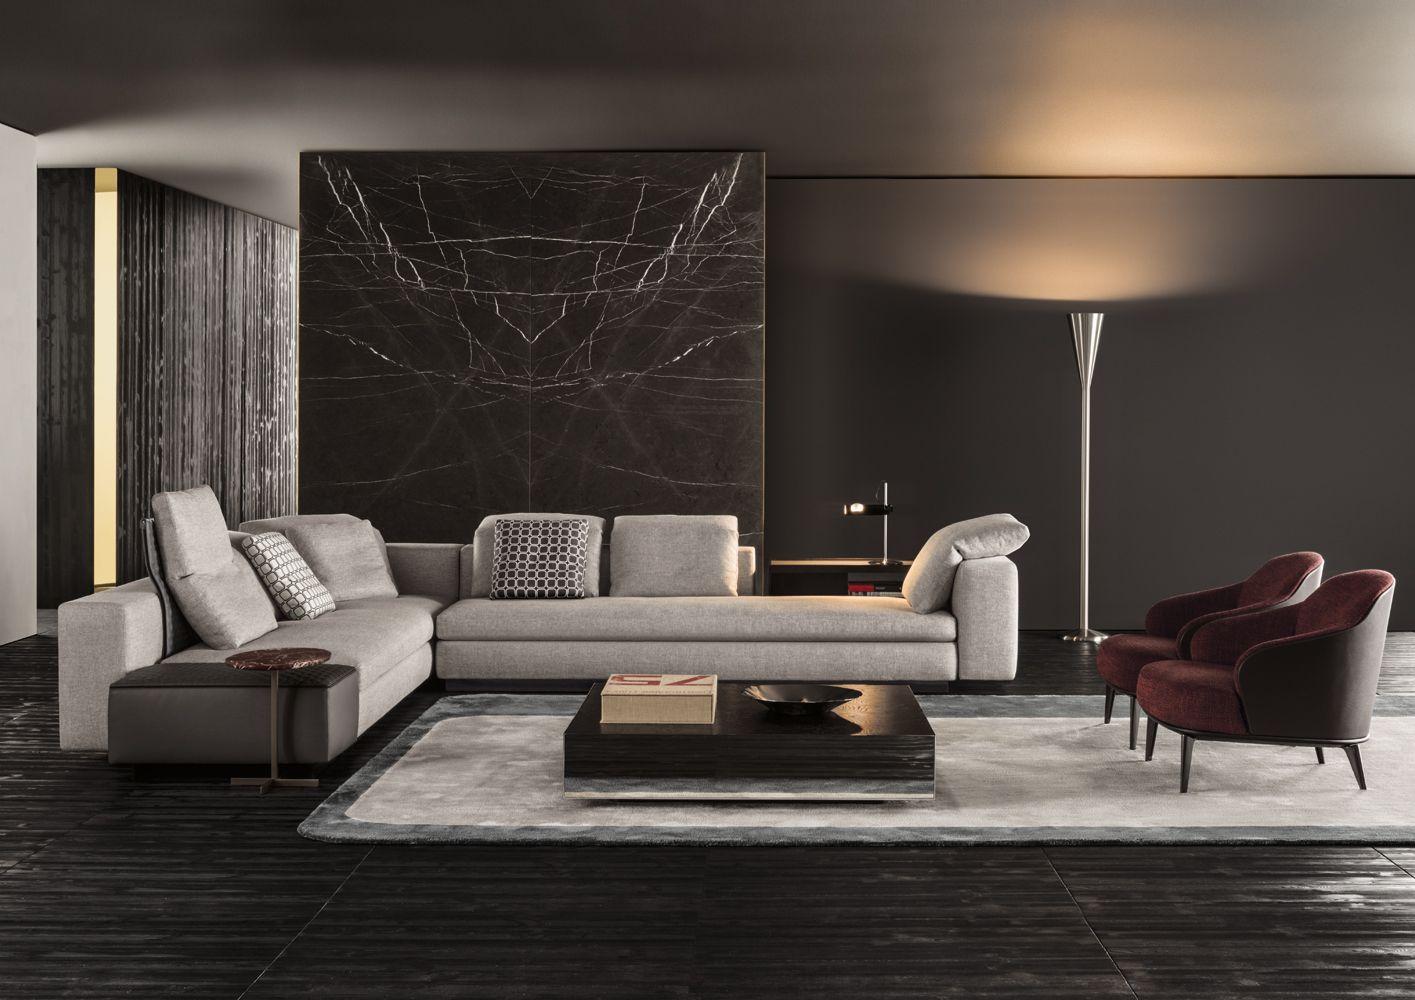 minotti sofas australia red sleeper sofa slipcover smink incorporated products yang